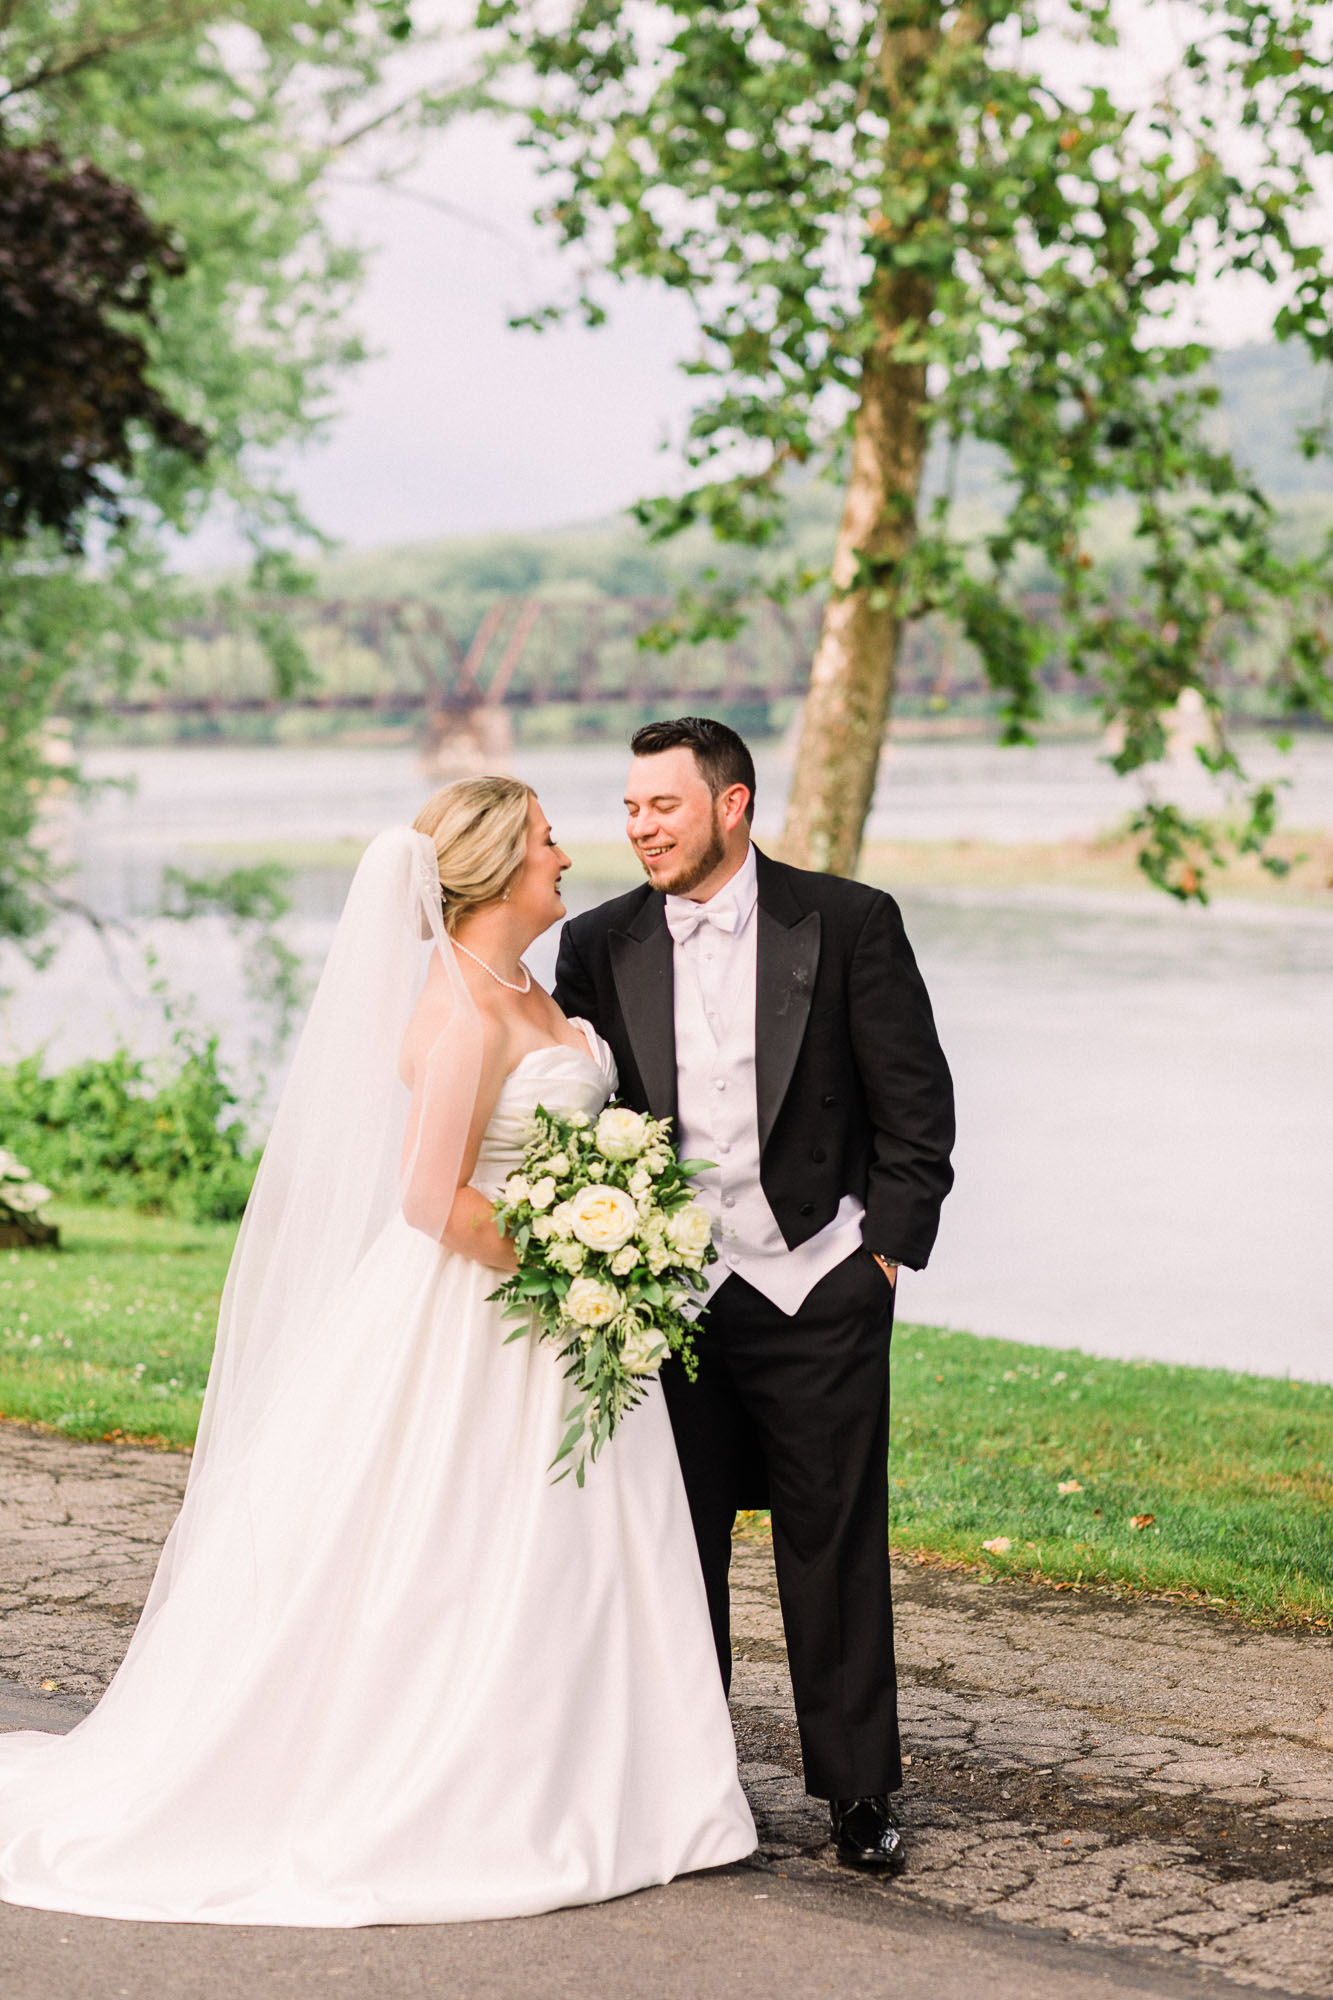 isle-of-que-wedding-4079.jpg